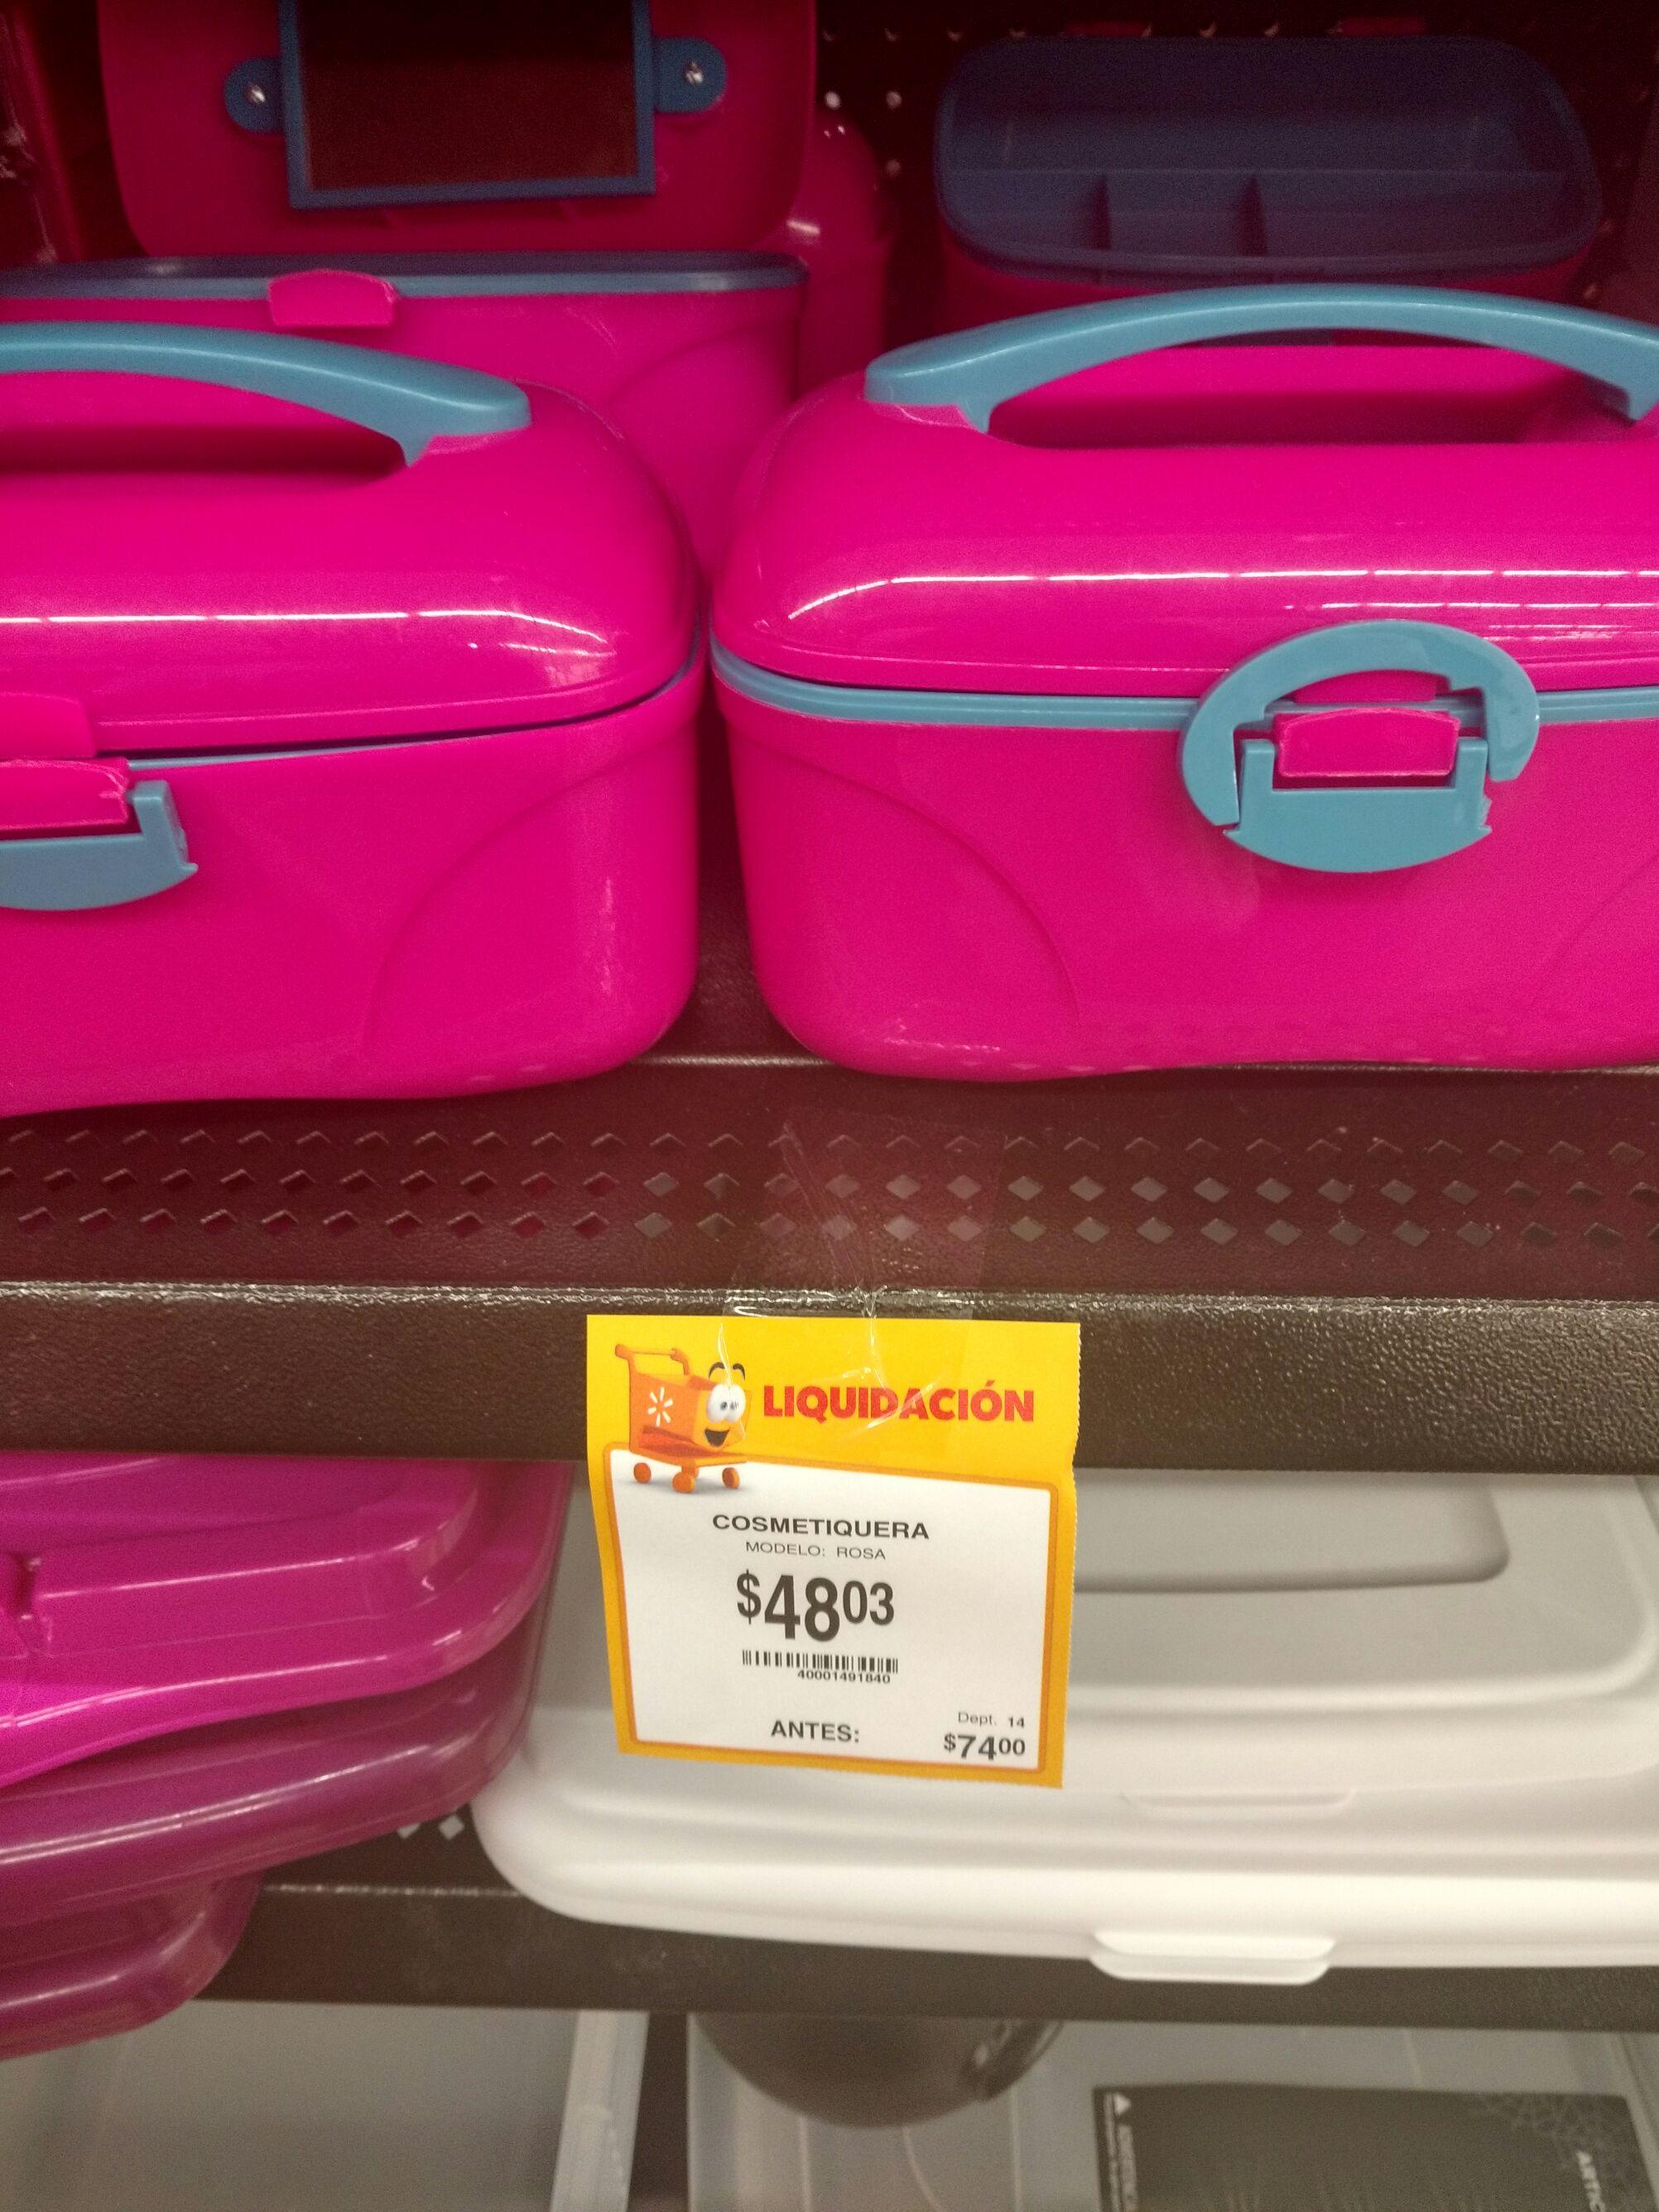 Walmart polígono: Cosmetiquera